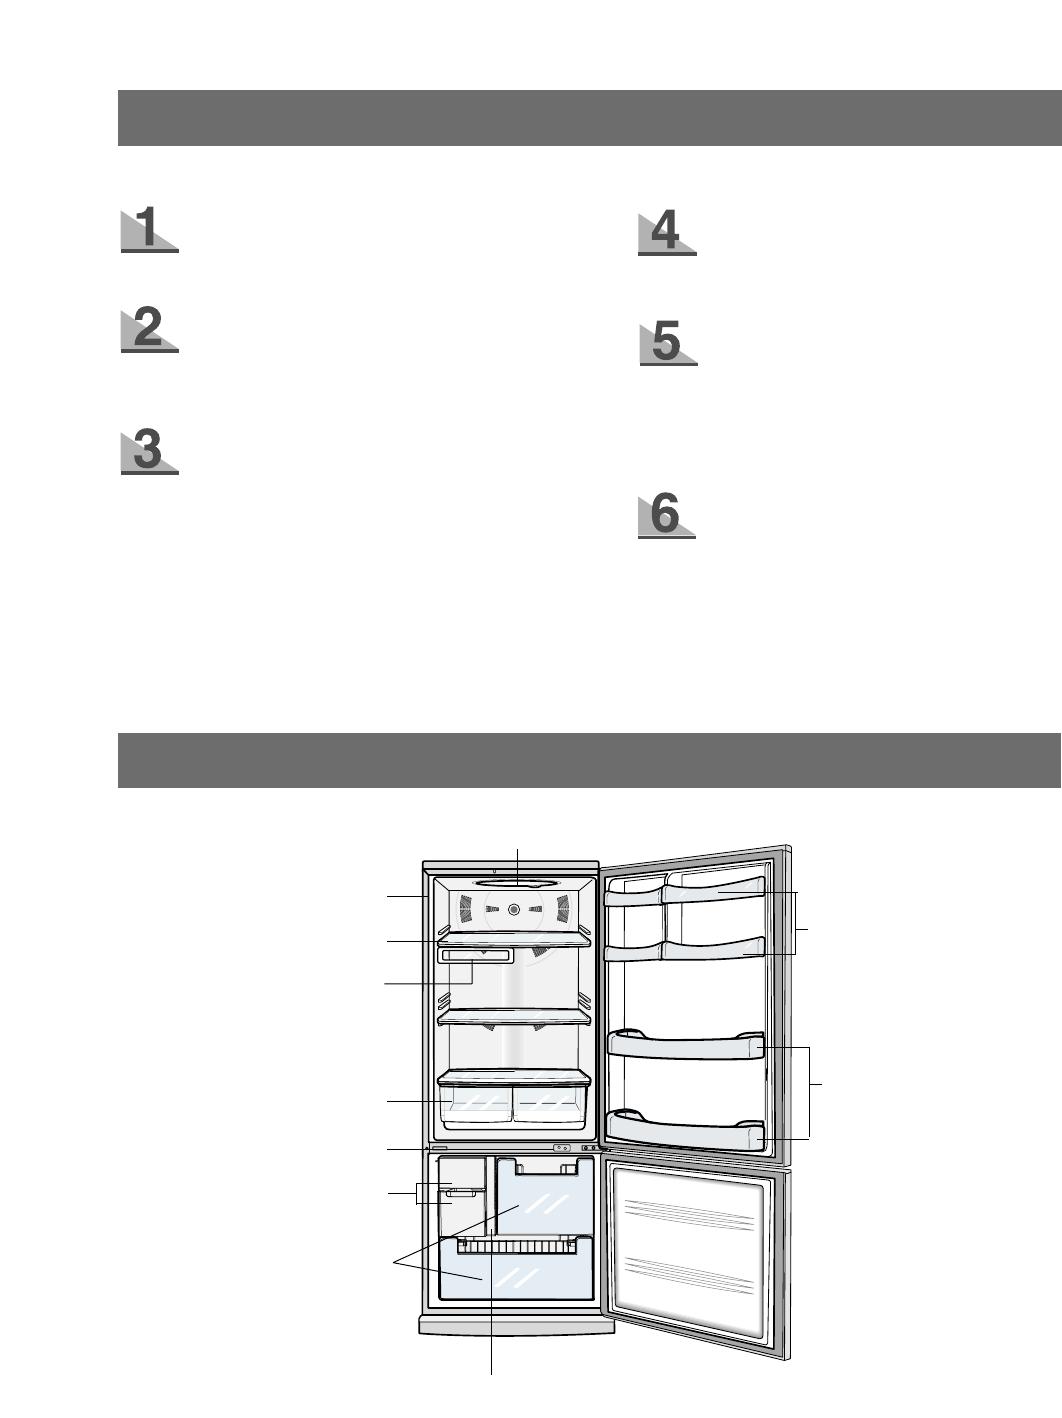 hight resolution of samsung rb215lash wiring schematic wiring diagram technic samsung refrigerator rb215labp wiring diagram